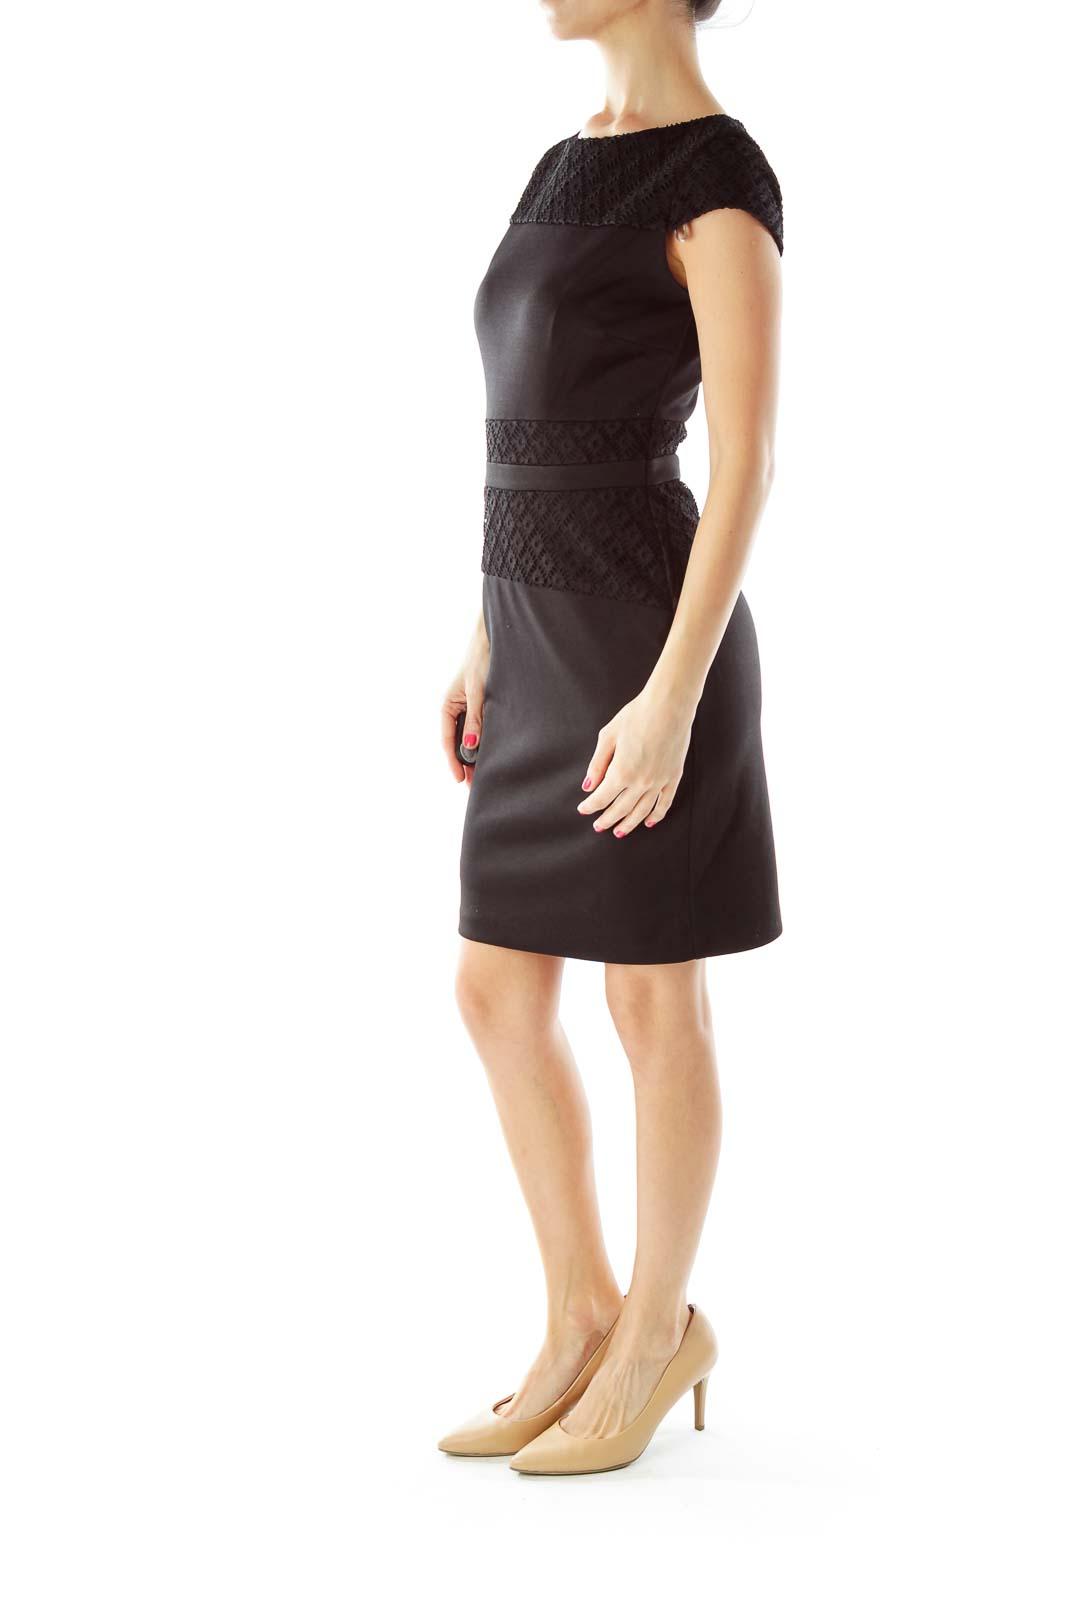 Black Crocheted Work Dress